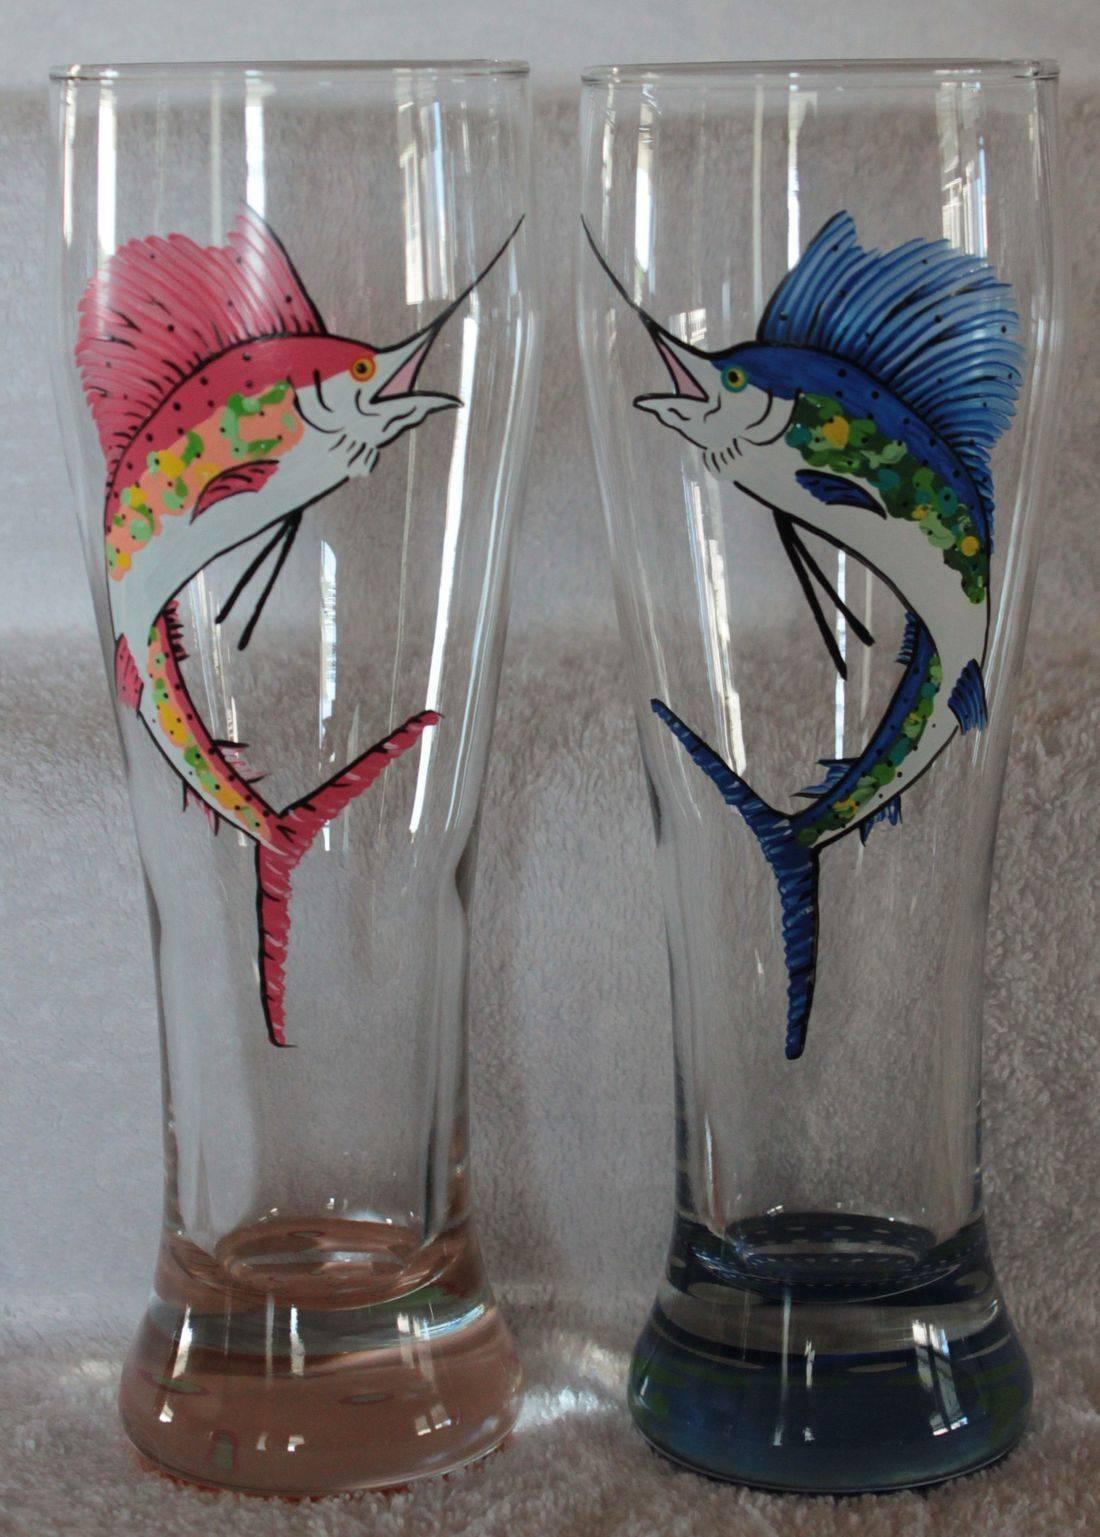 sport fishing wine glass, sport fishing beer glass